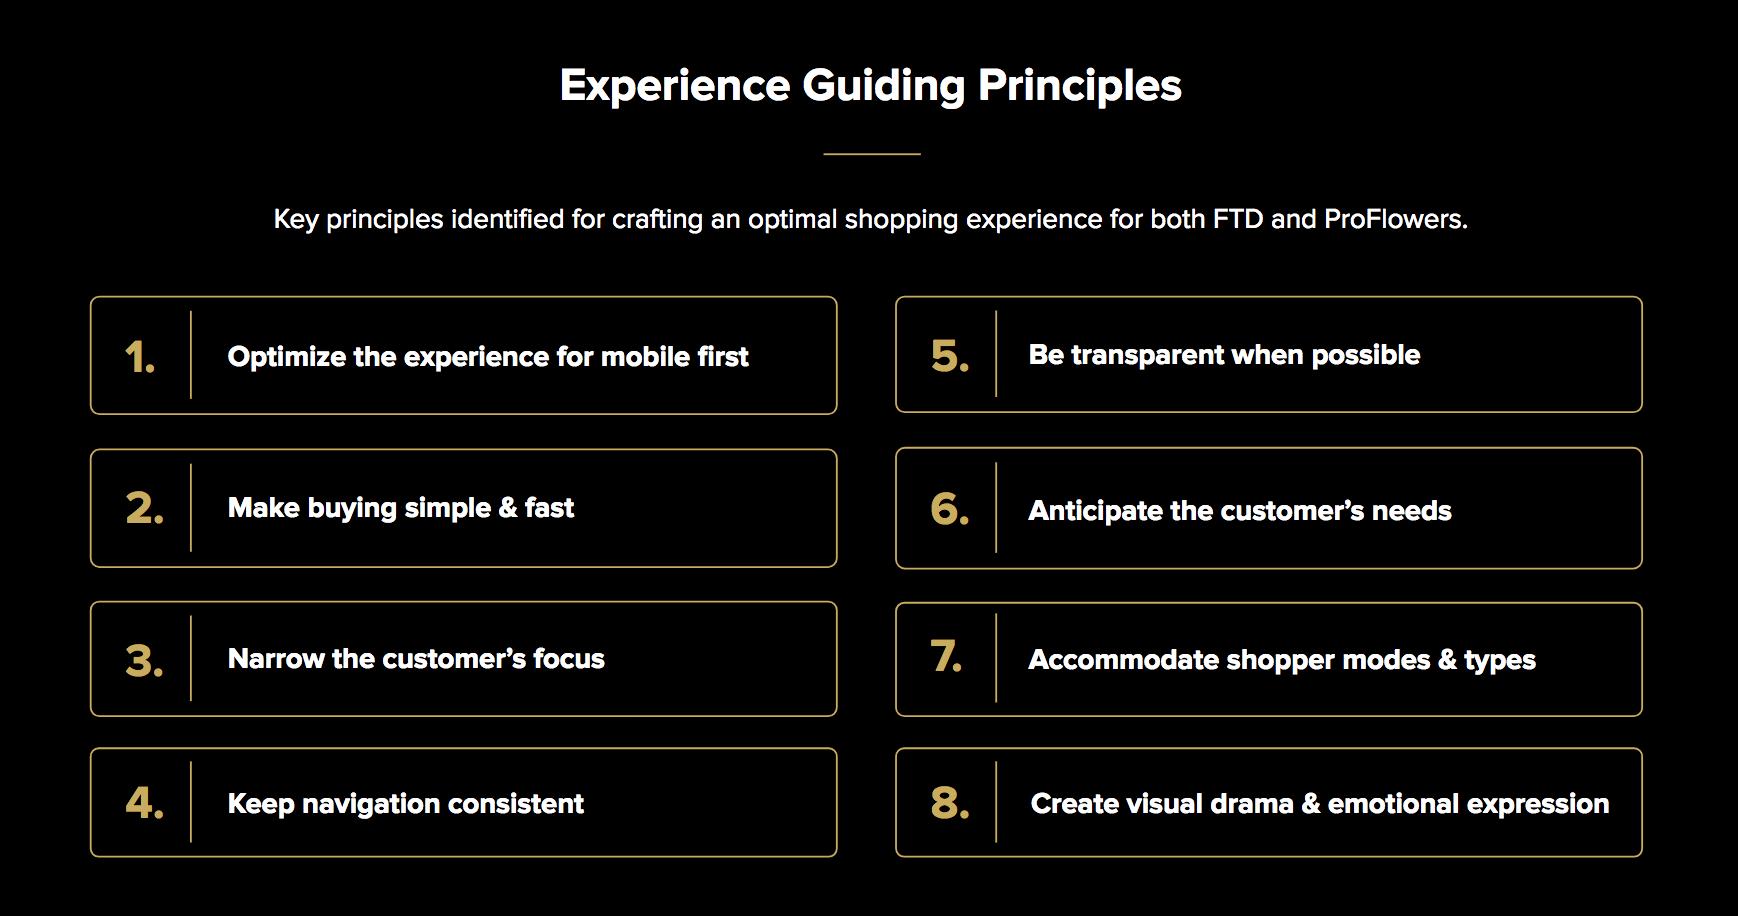 ExperiencePrinciples.jpg